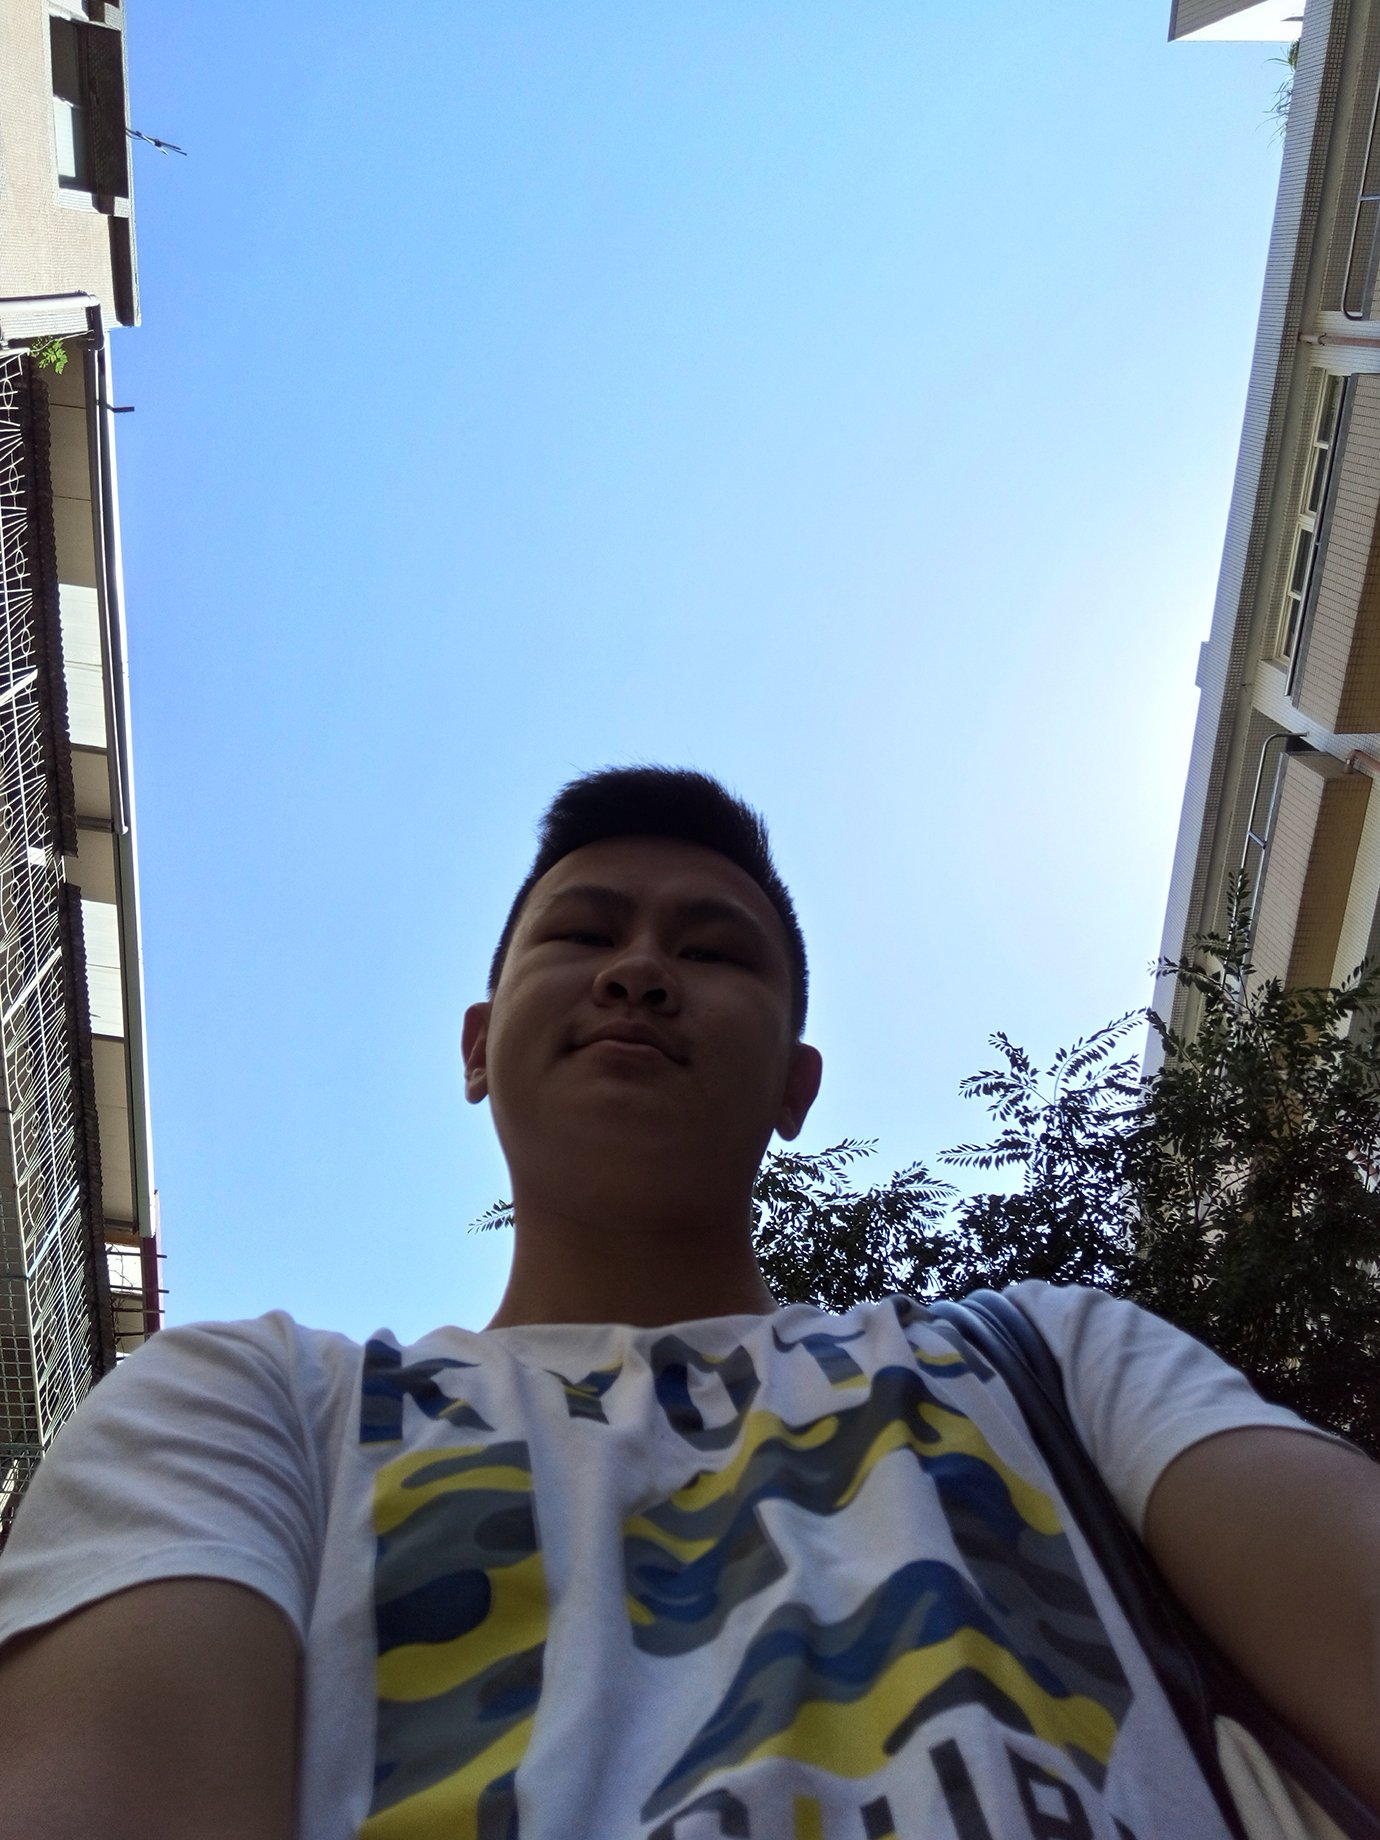 Sony Xperia M5 фото с камеры